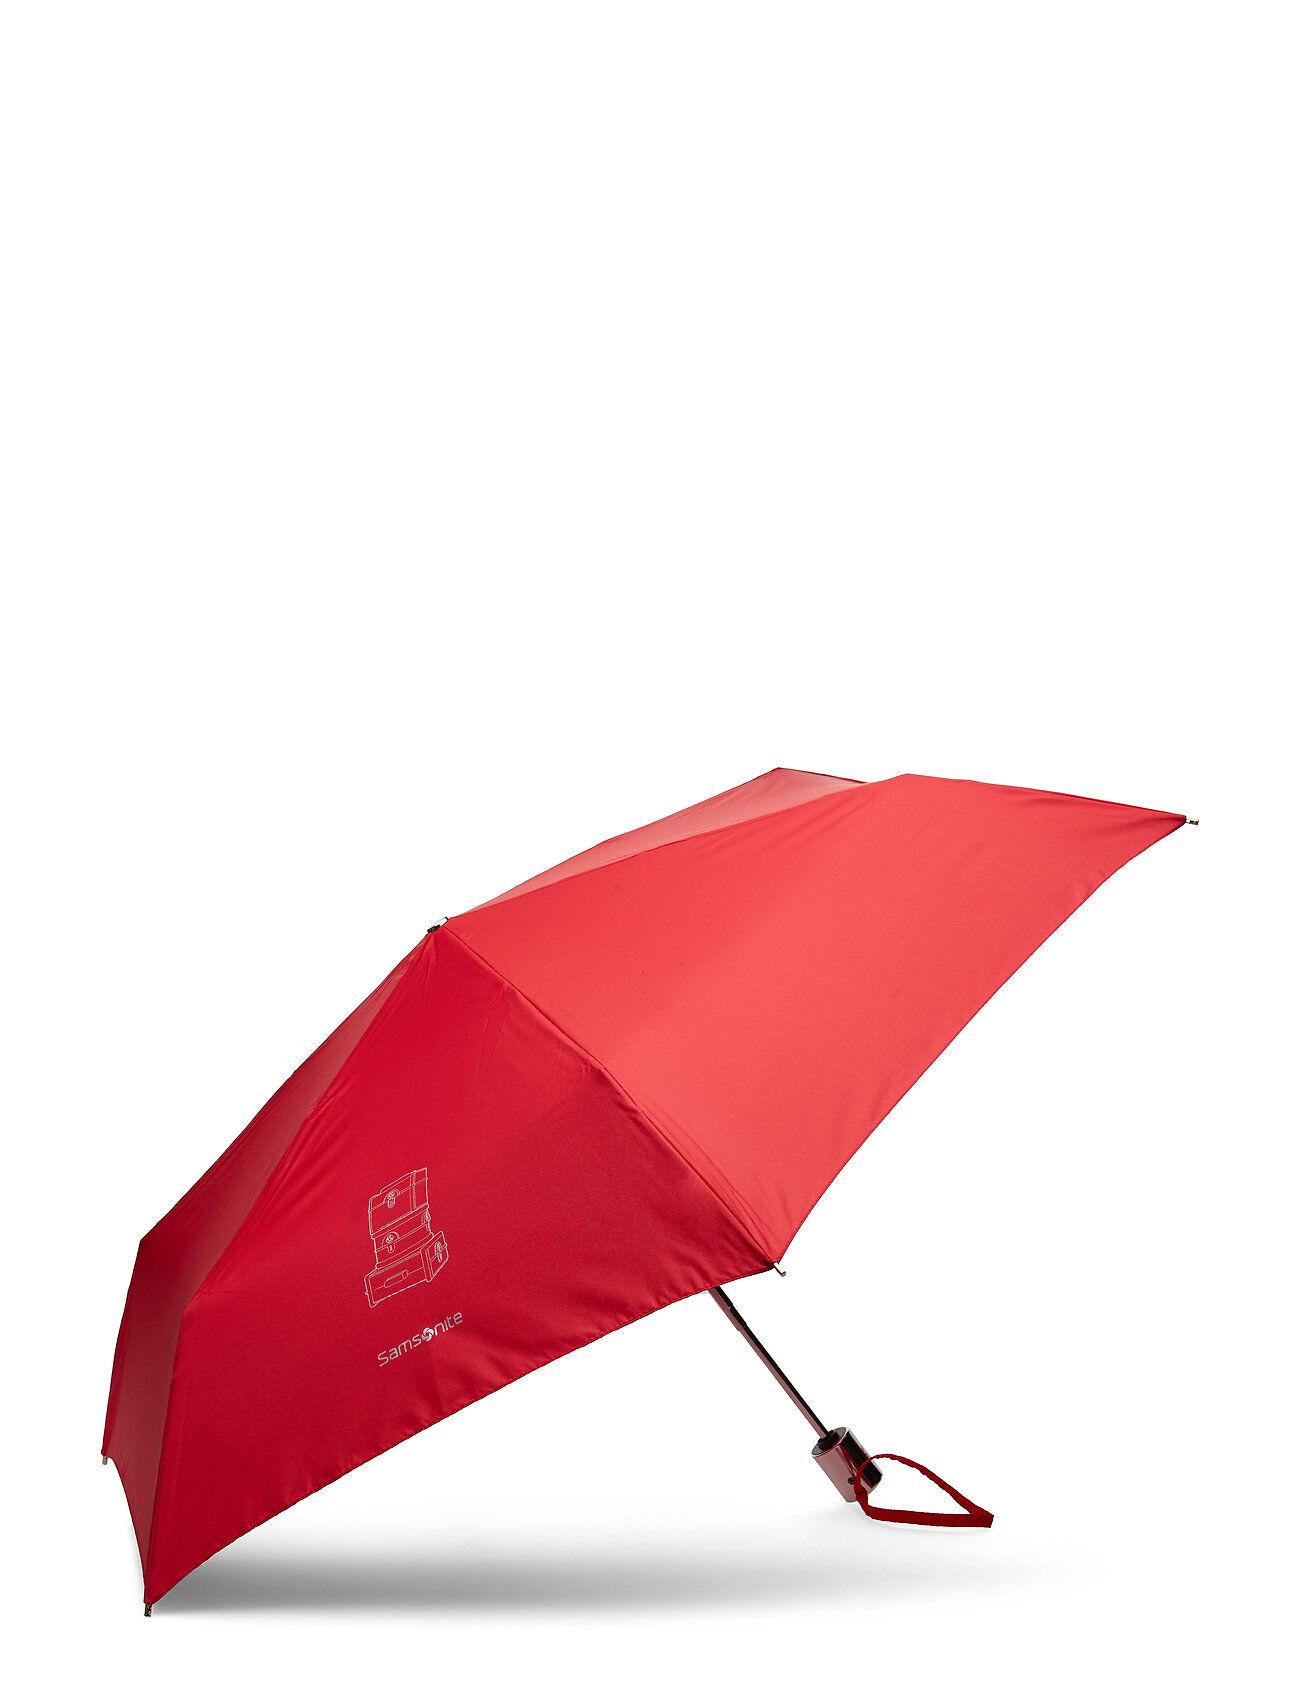 Samsonite Karissa Umbrellas Auto Sateenvarjo Punainen